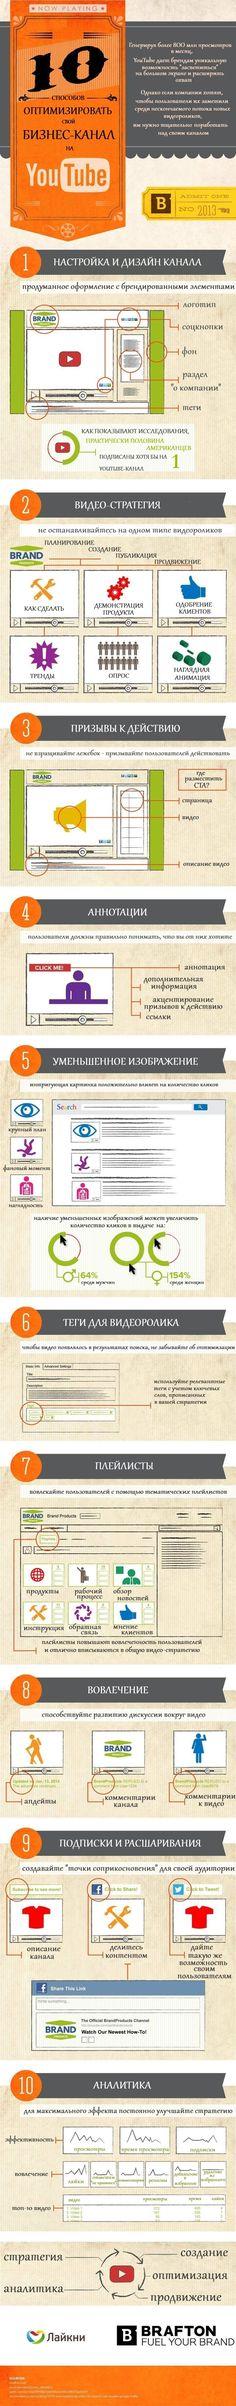 Инфографика: оптимизация YouTube-канала  Подробнее: http://www.likeni.ru/events/infografika-optimizatsiya-youtube-kanala/